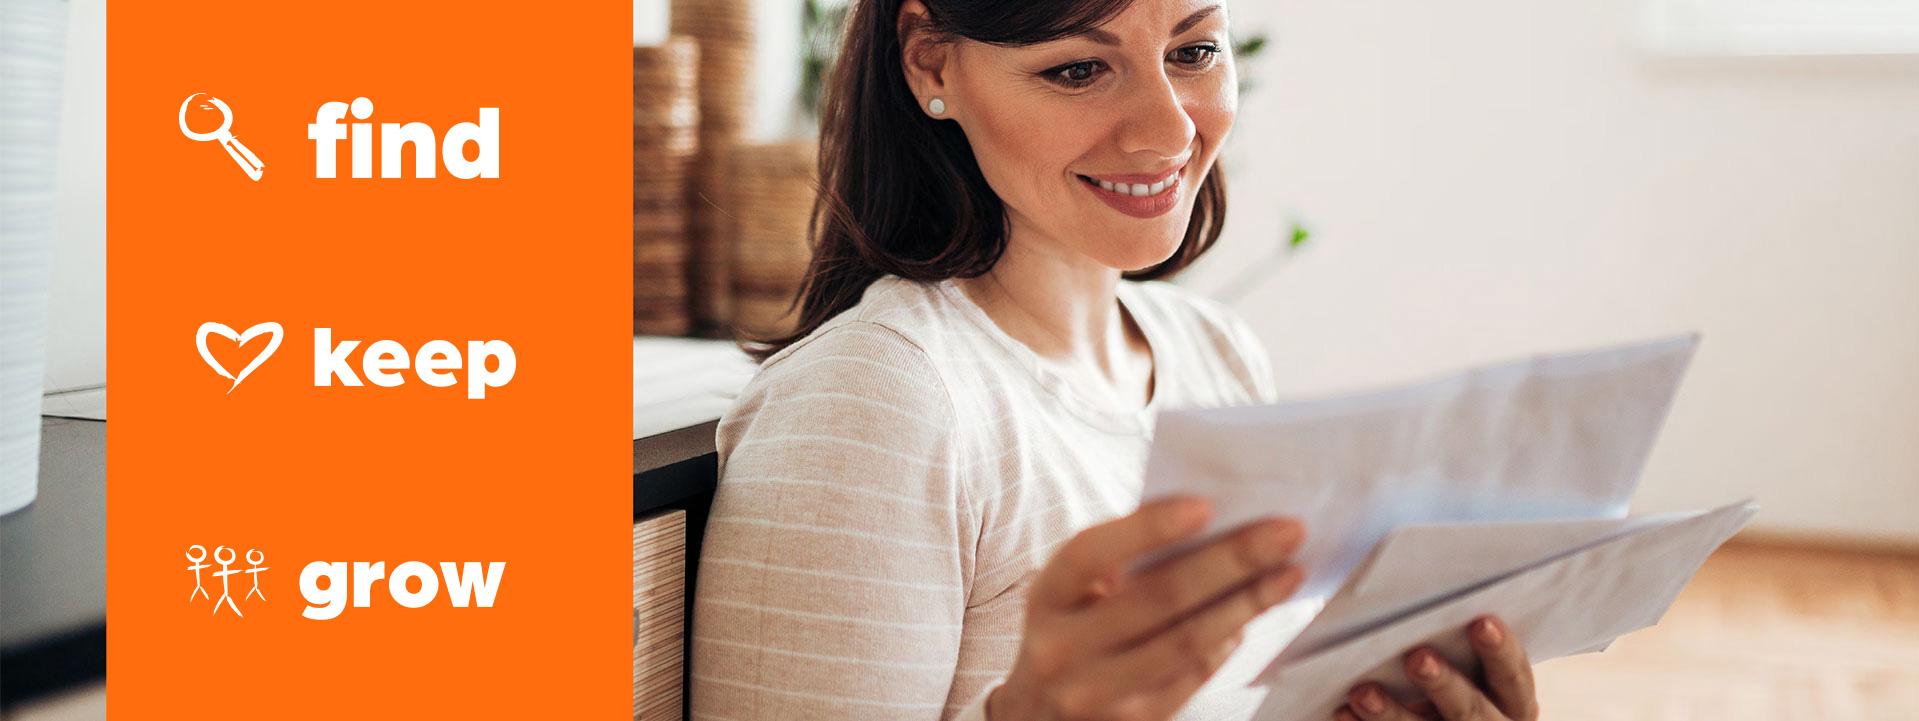 woman reading direct marketing envelopes